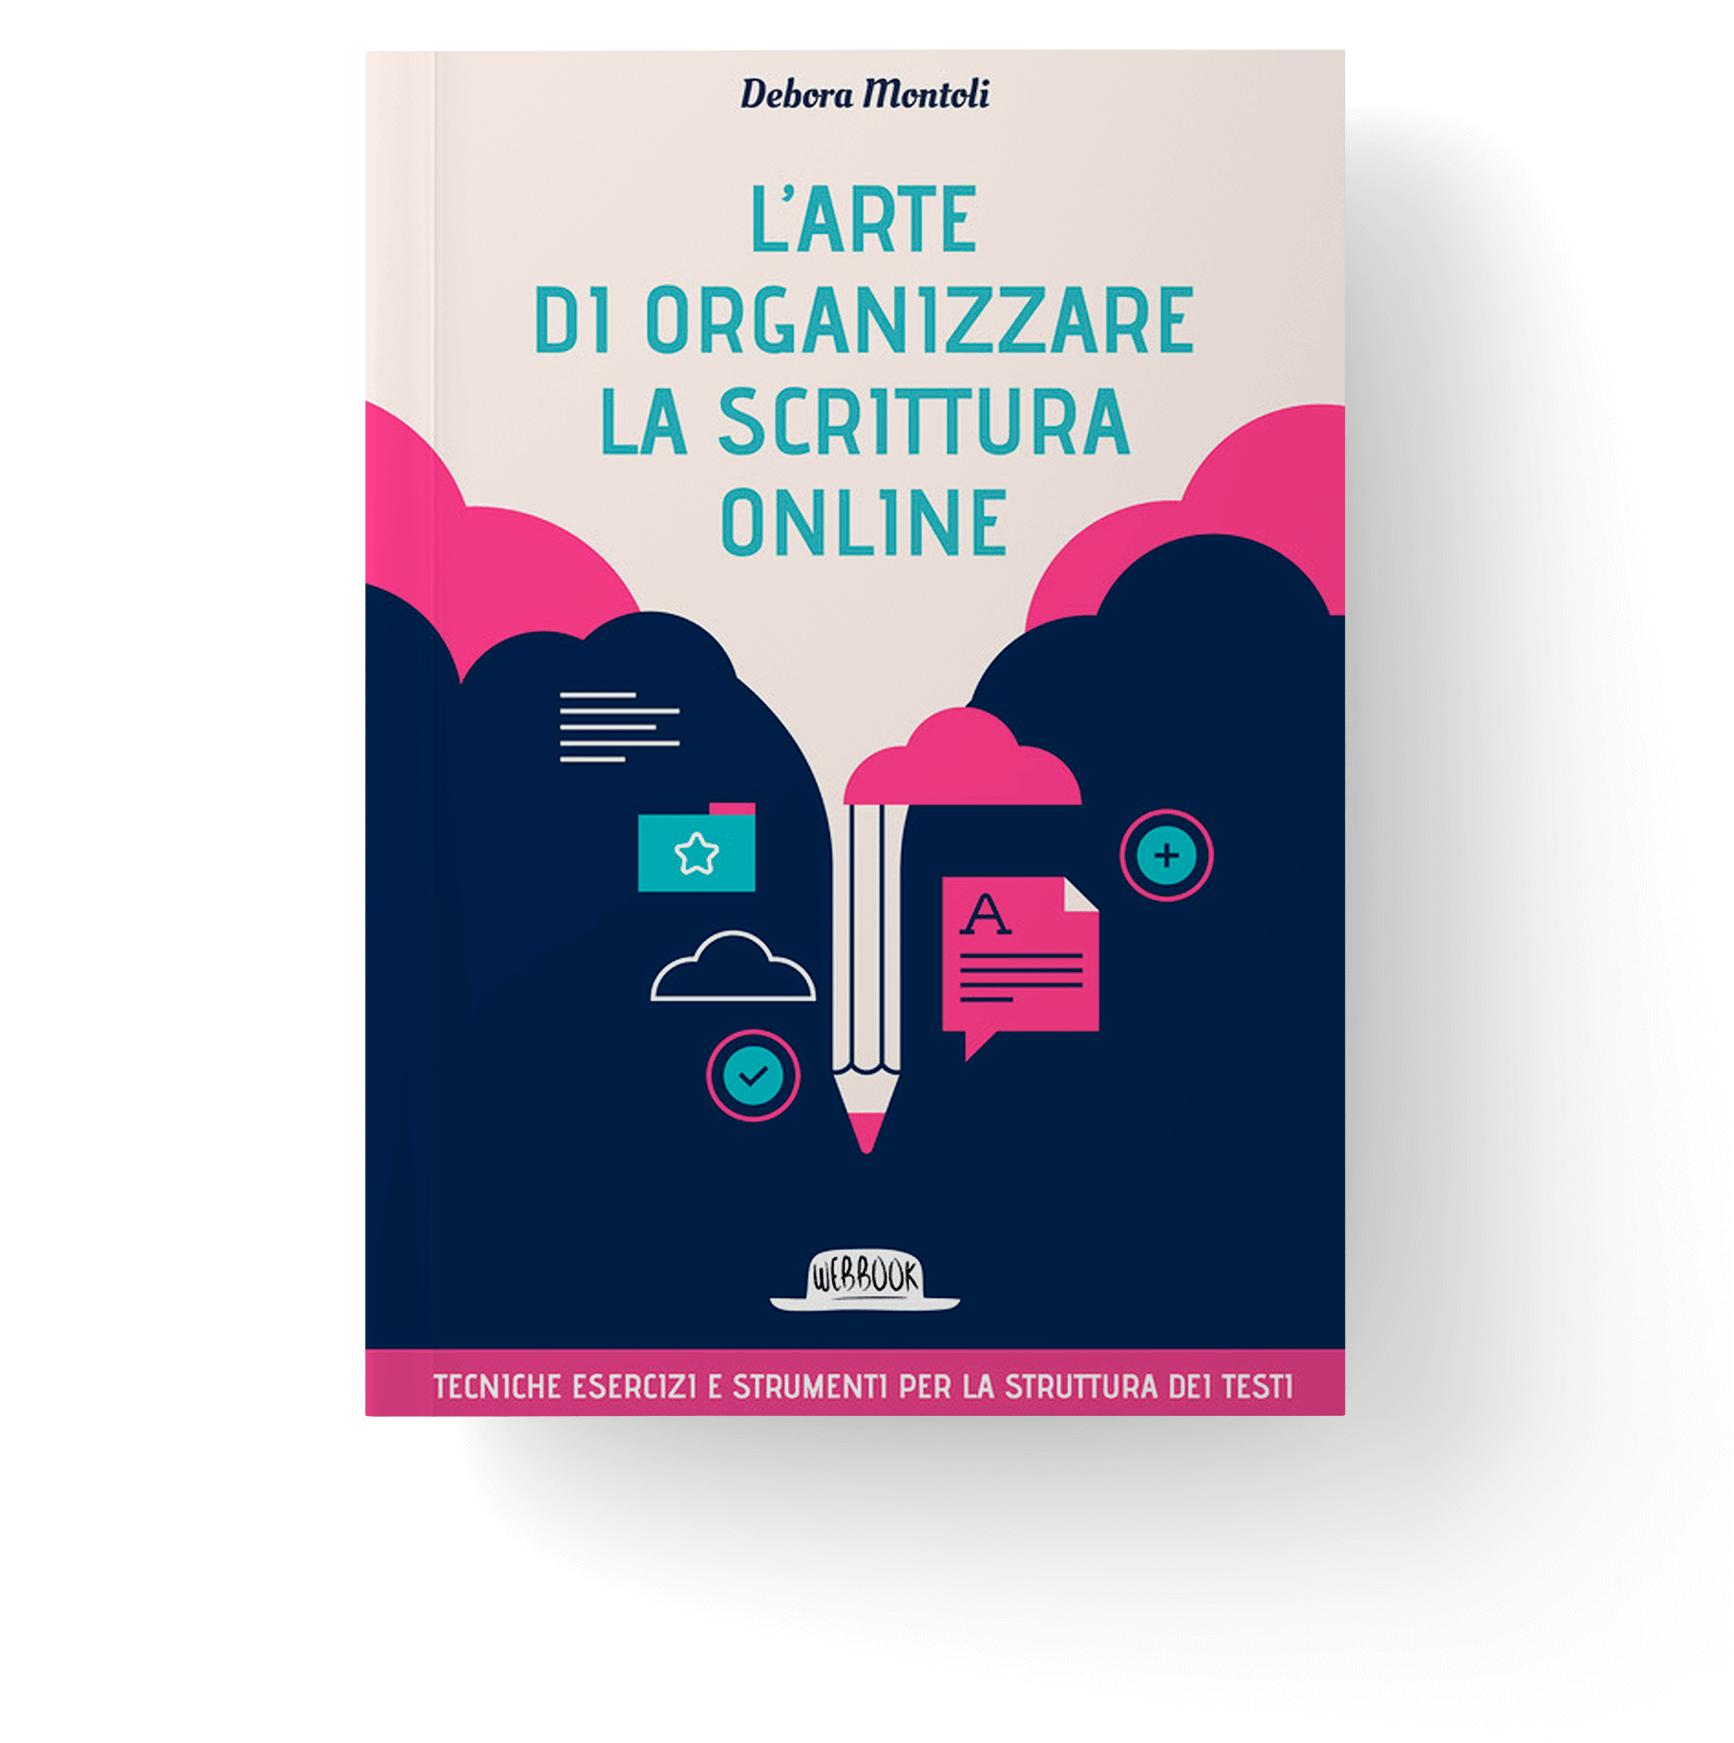 libro organizzare la scrittura online debora montoli - anteprima